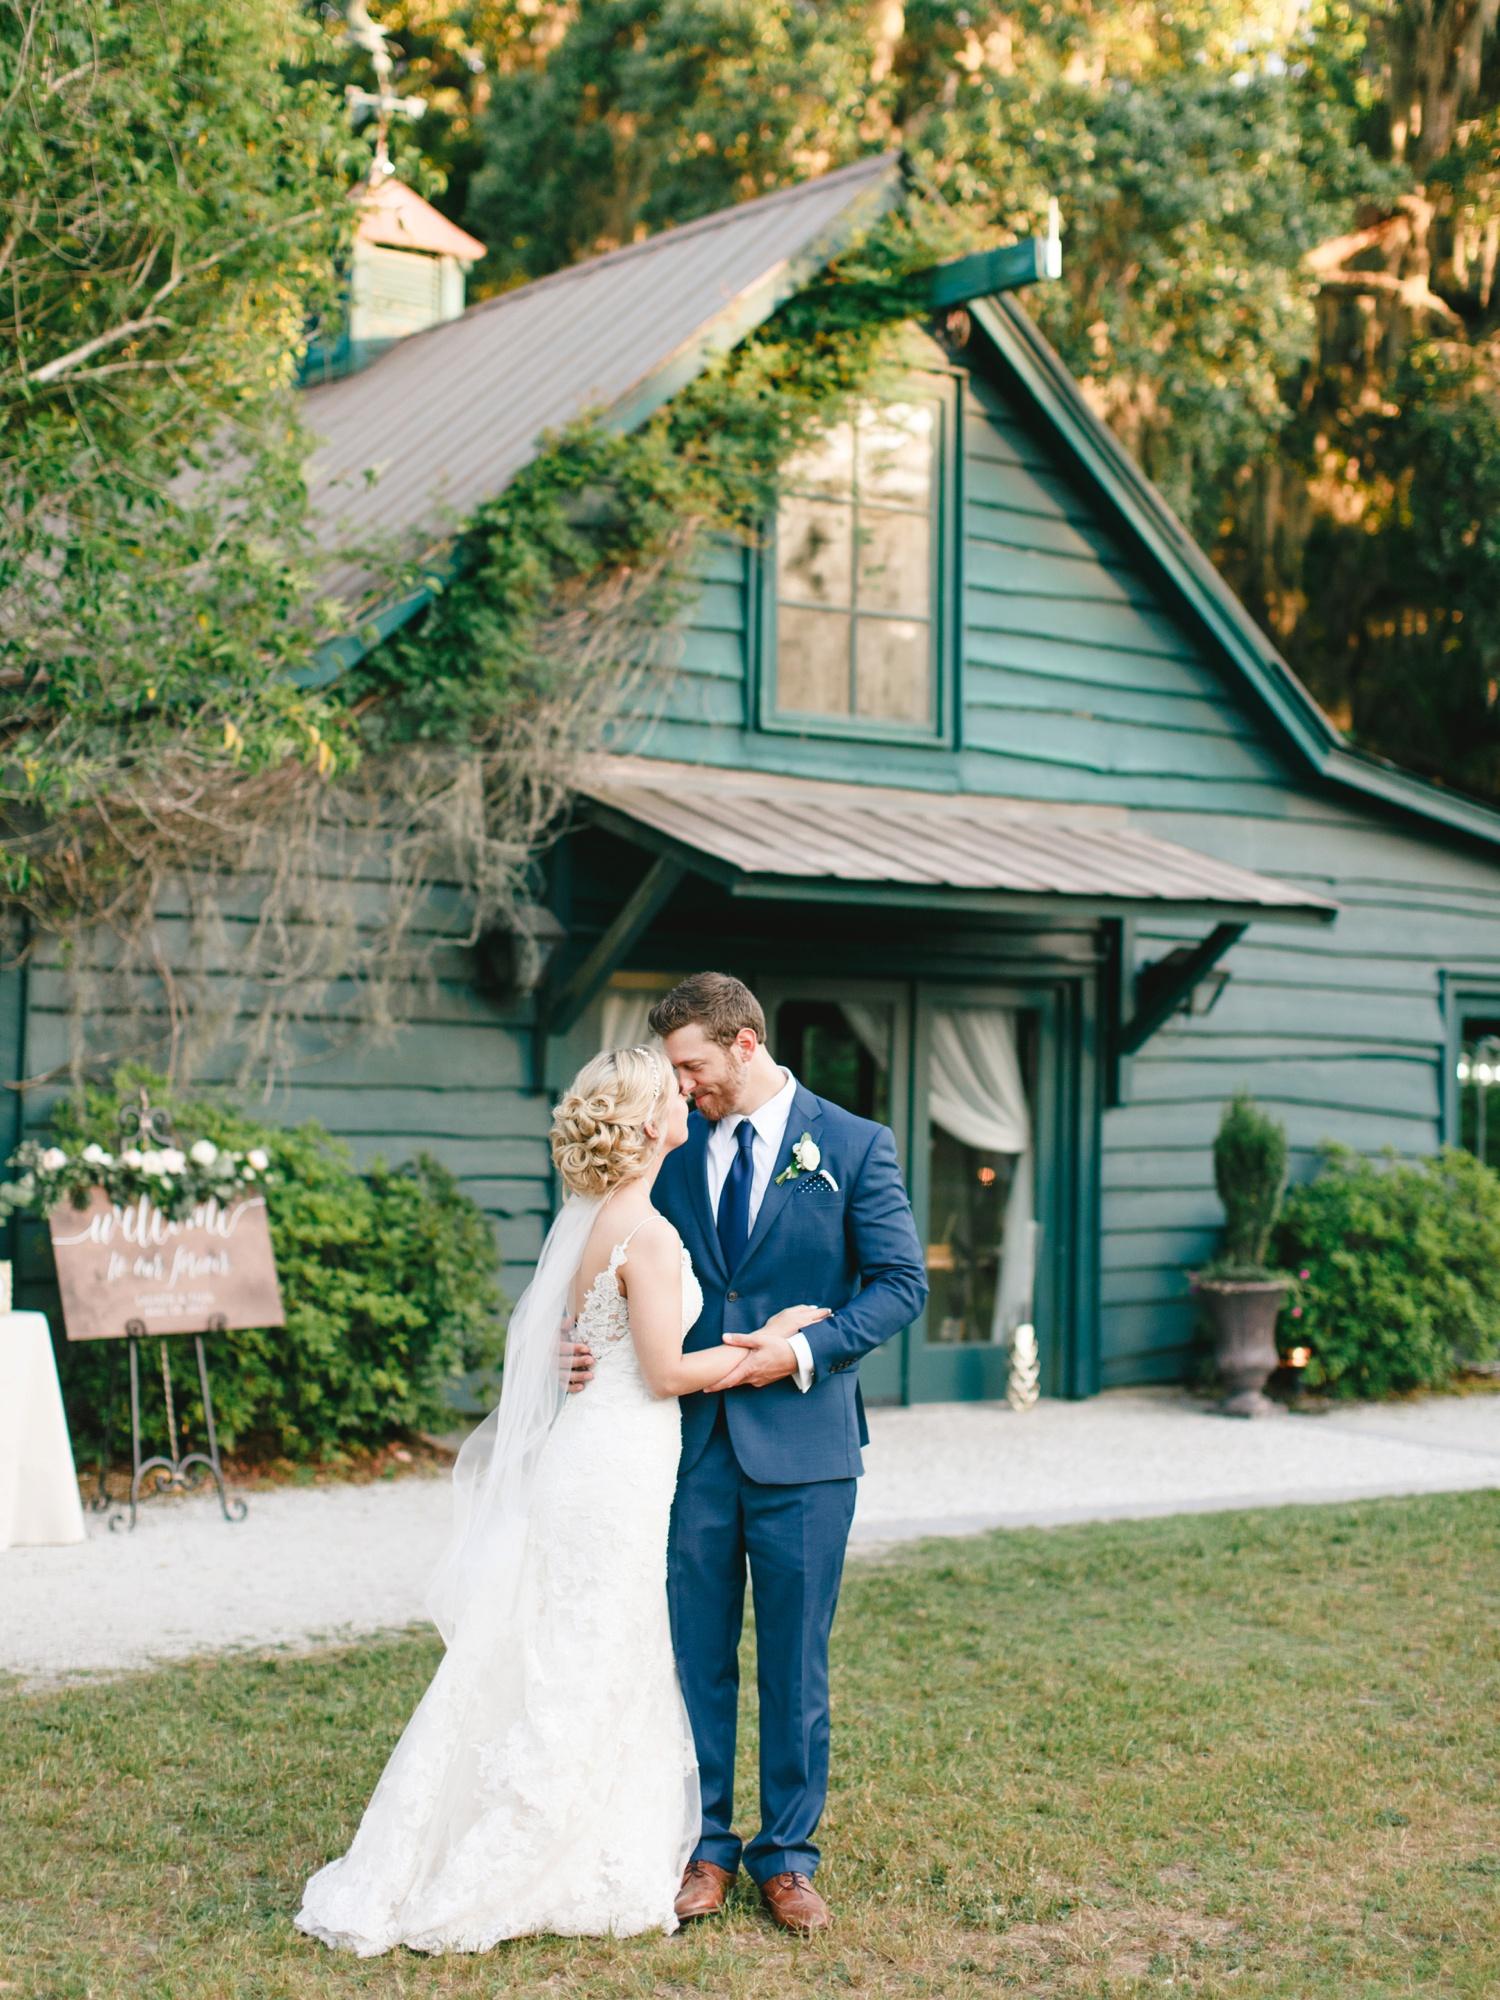 Magnolia-Garden-Southern-Weddings-Magazine_0040.jpg